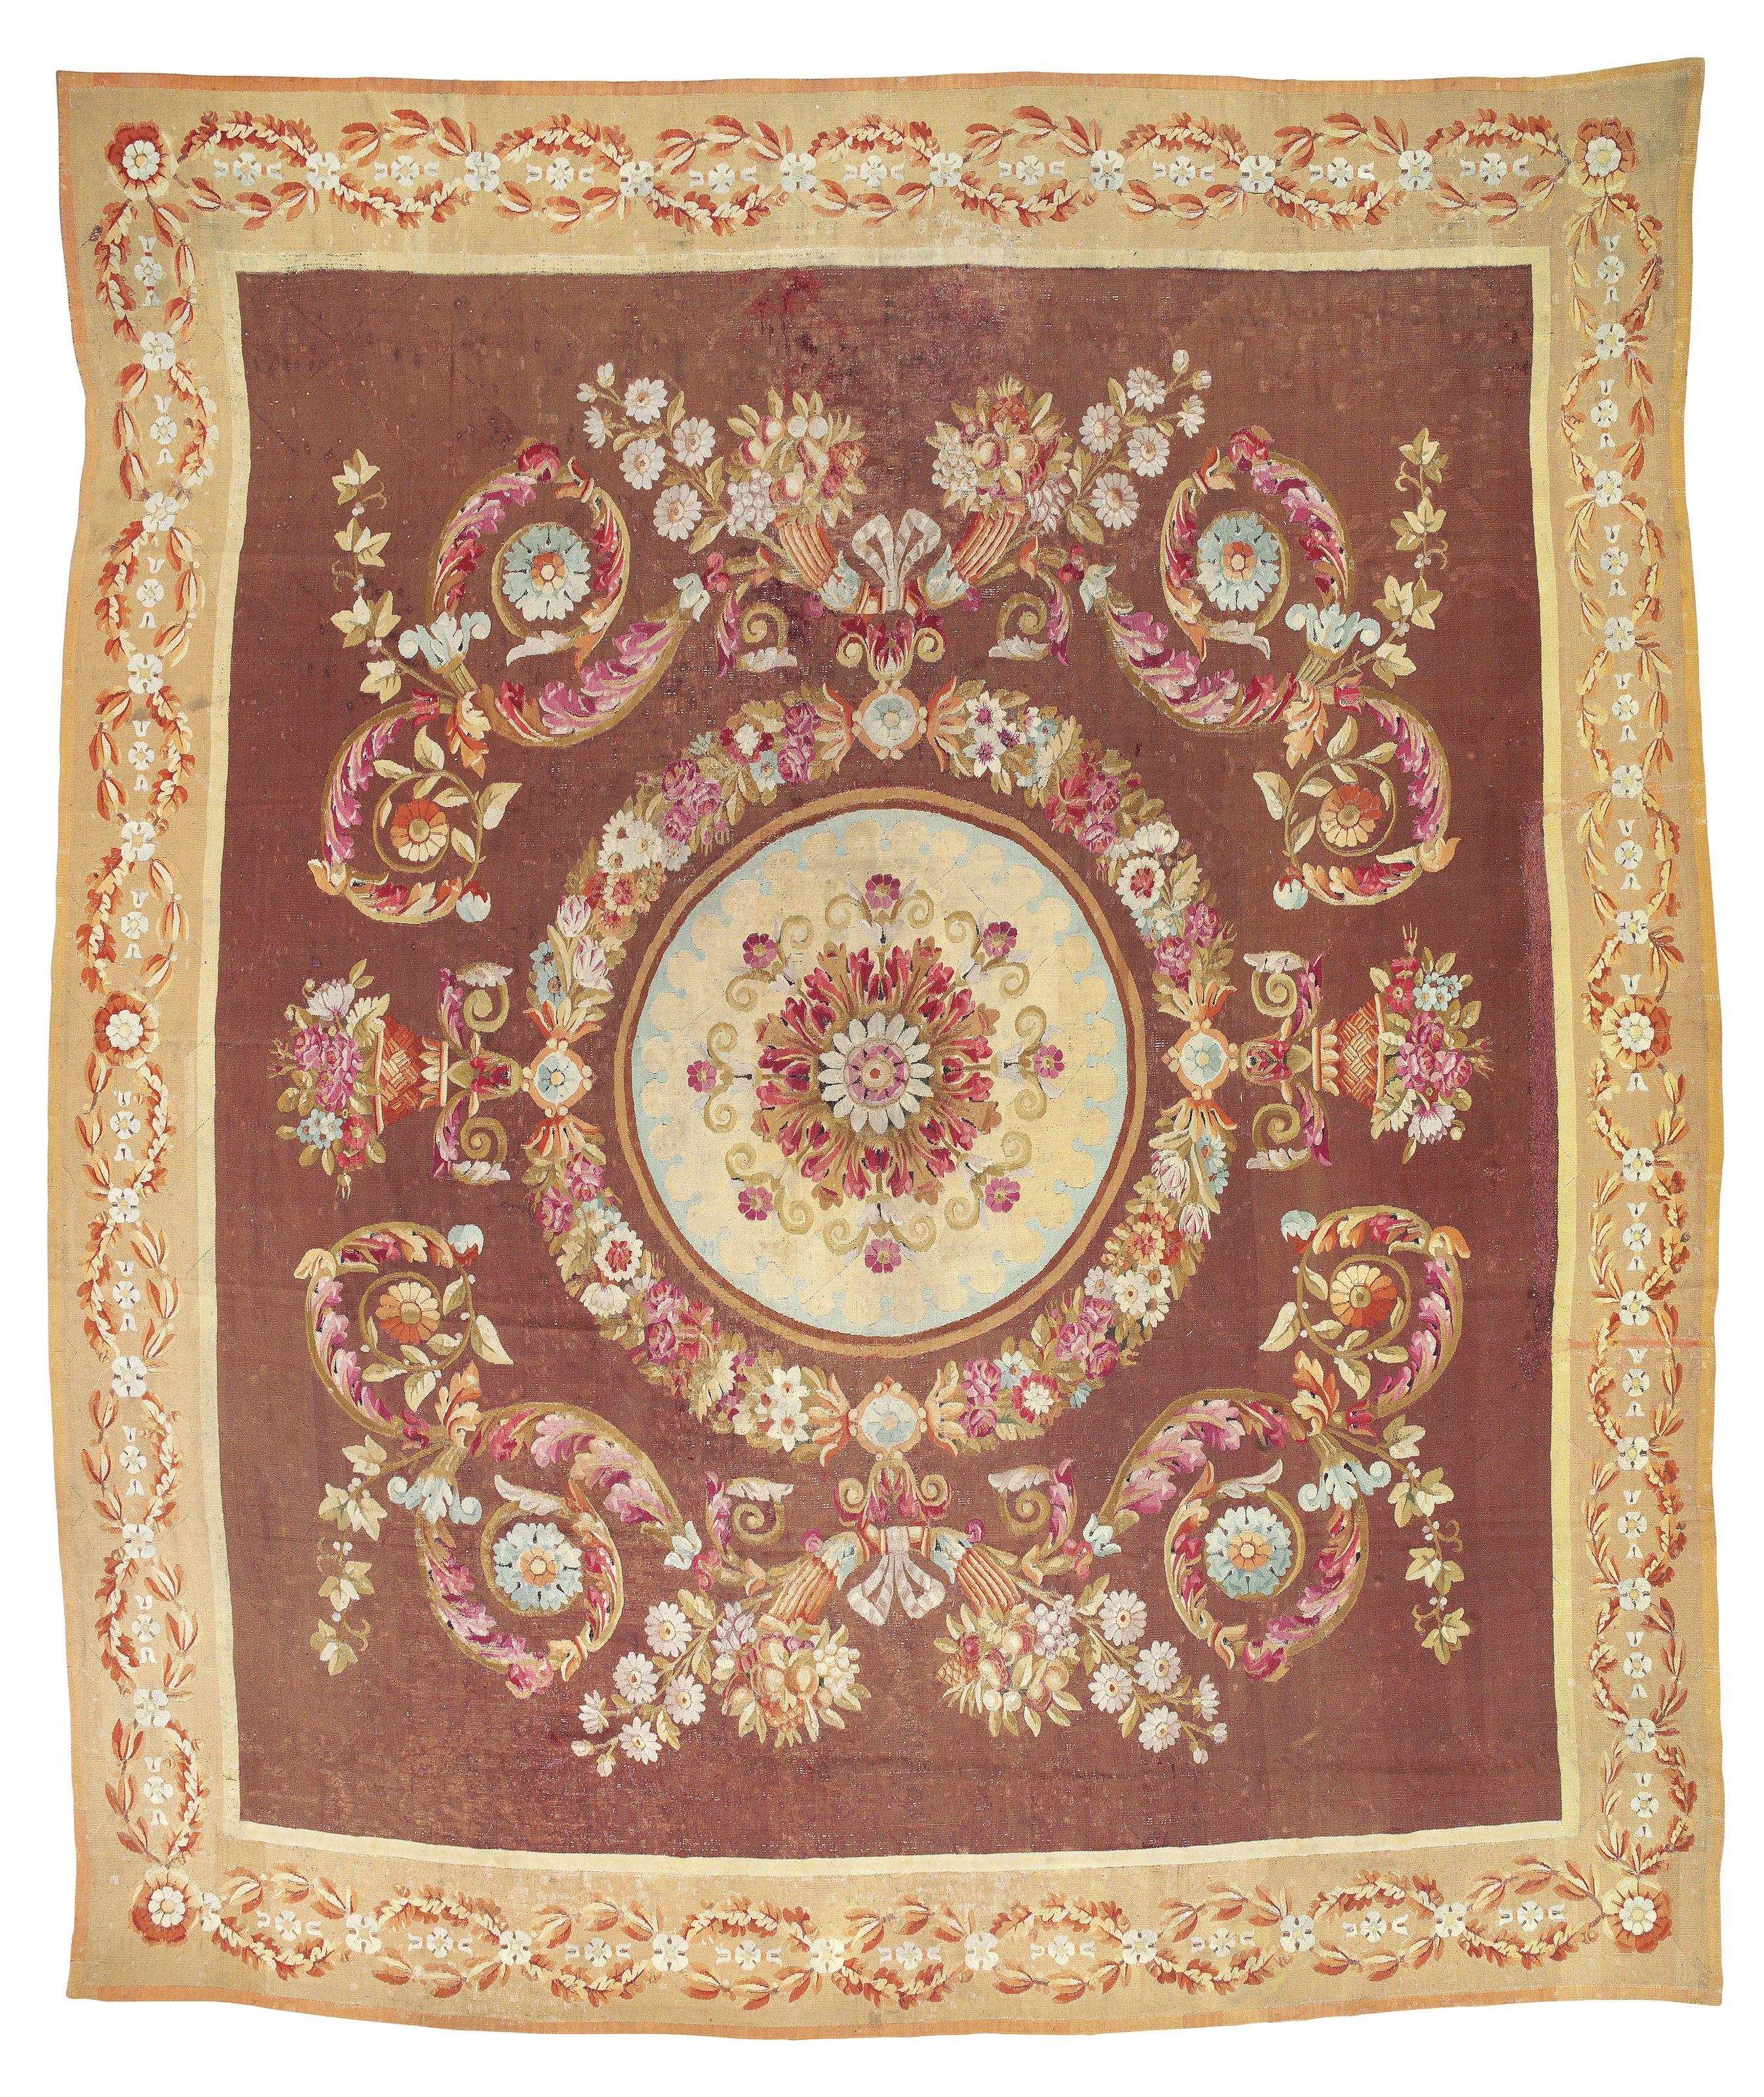 C1830 A Charles X Aubusson Carpet France Circa 1830 Price Realised Gbp 3 750 France Charles Carpet